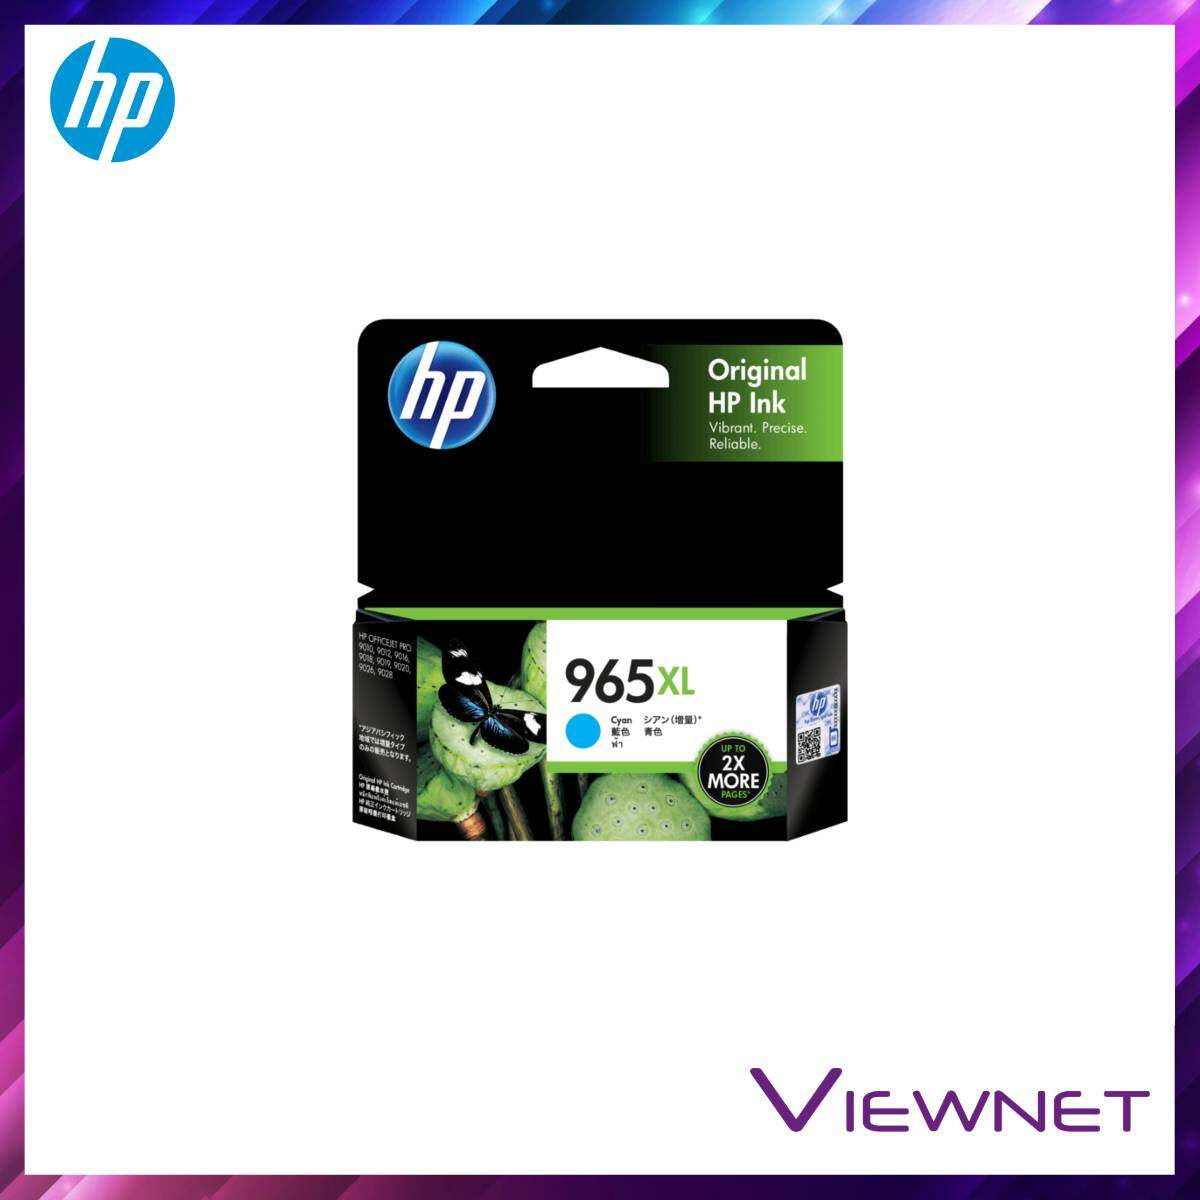 HP Original Ink Cartridge (3JA84AA/965XL) Black / Yellow / Magenta / Cyan